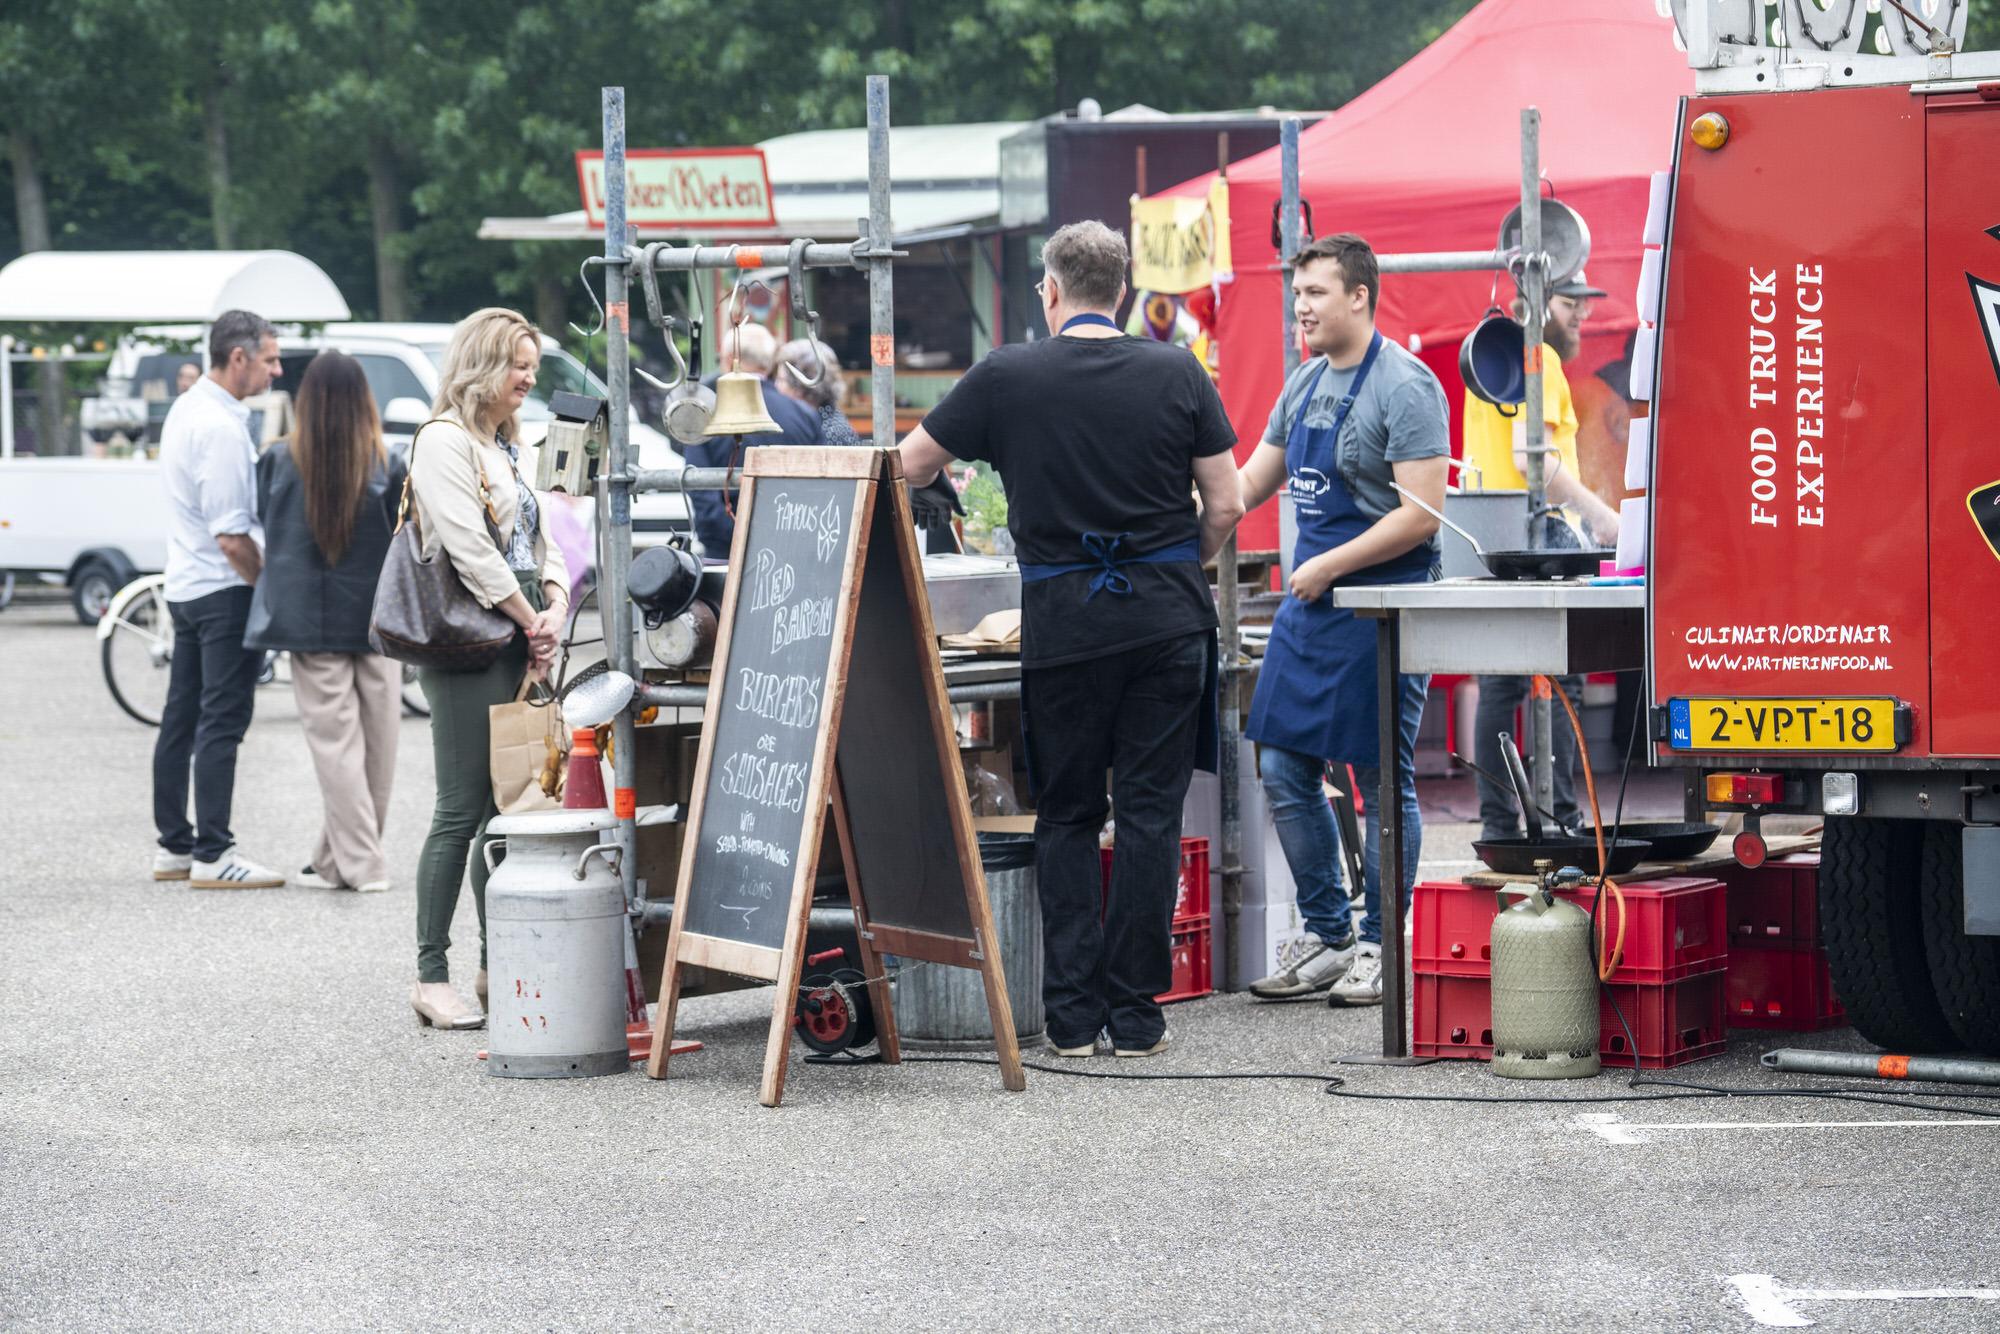 SPIJS-foodfestival-5juni21-00035.jpg